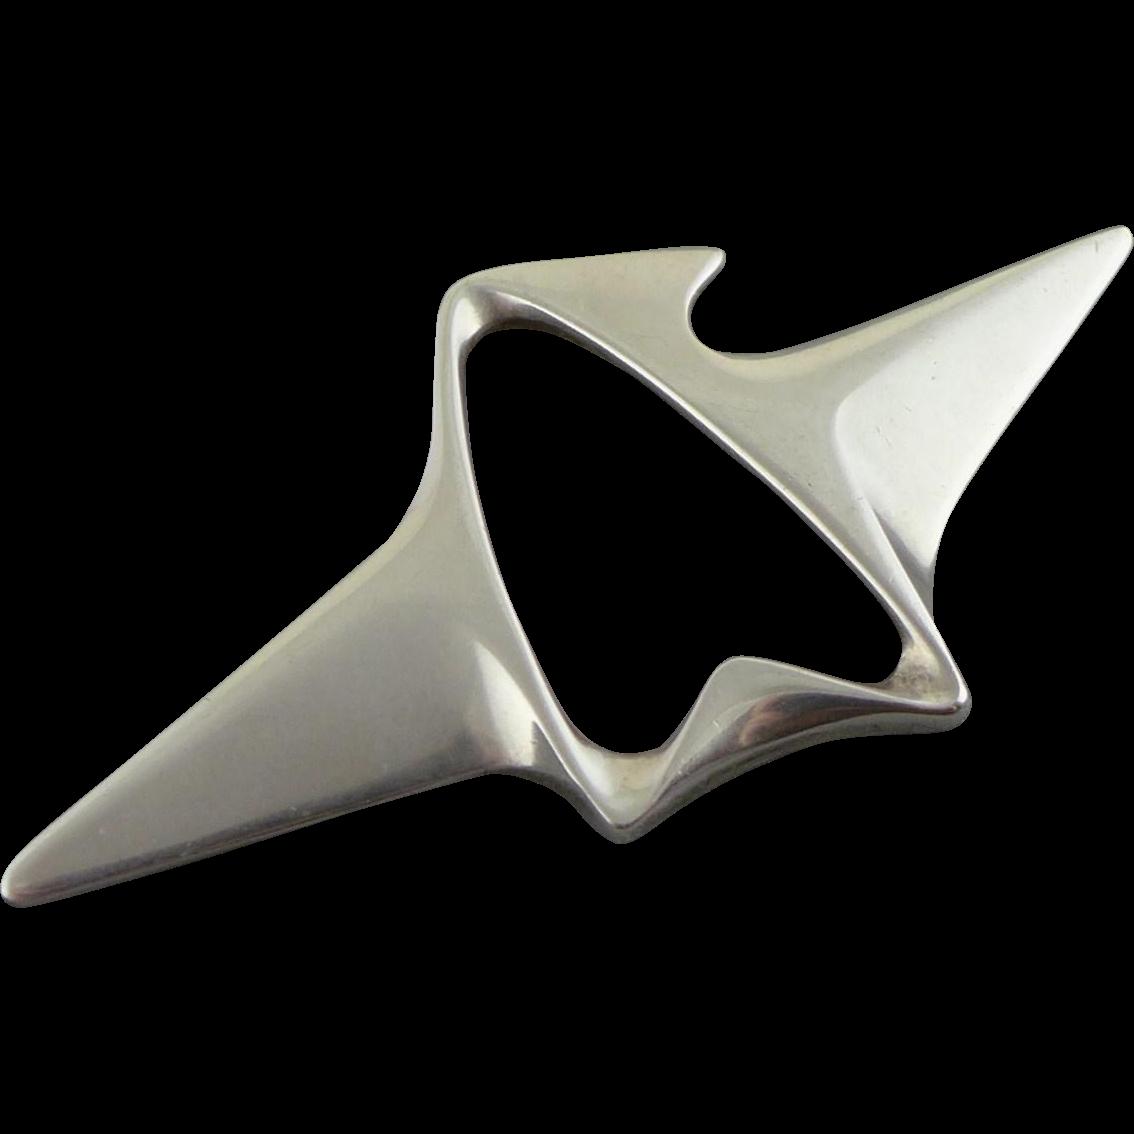 Vintage Georg Jensen Sterling Silver Brooch / Pin 340 Designed By Henning Koppel